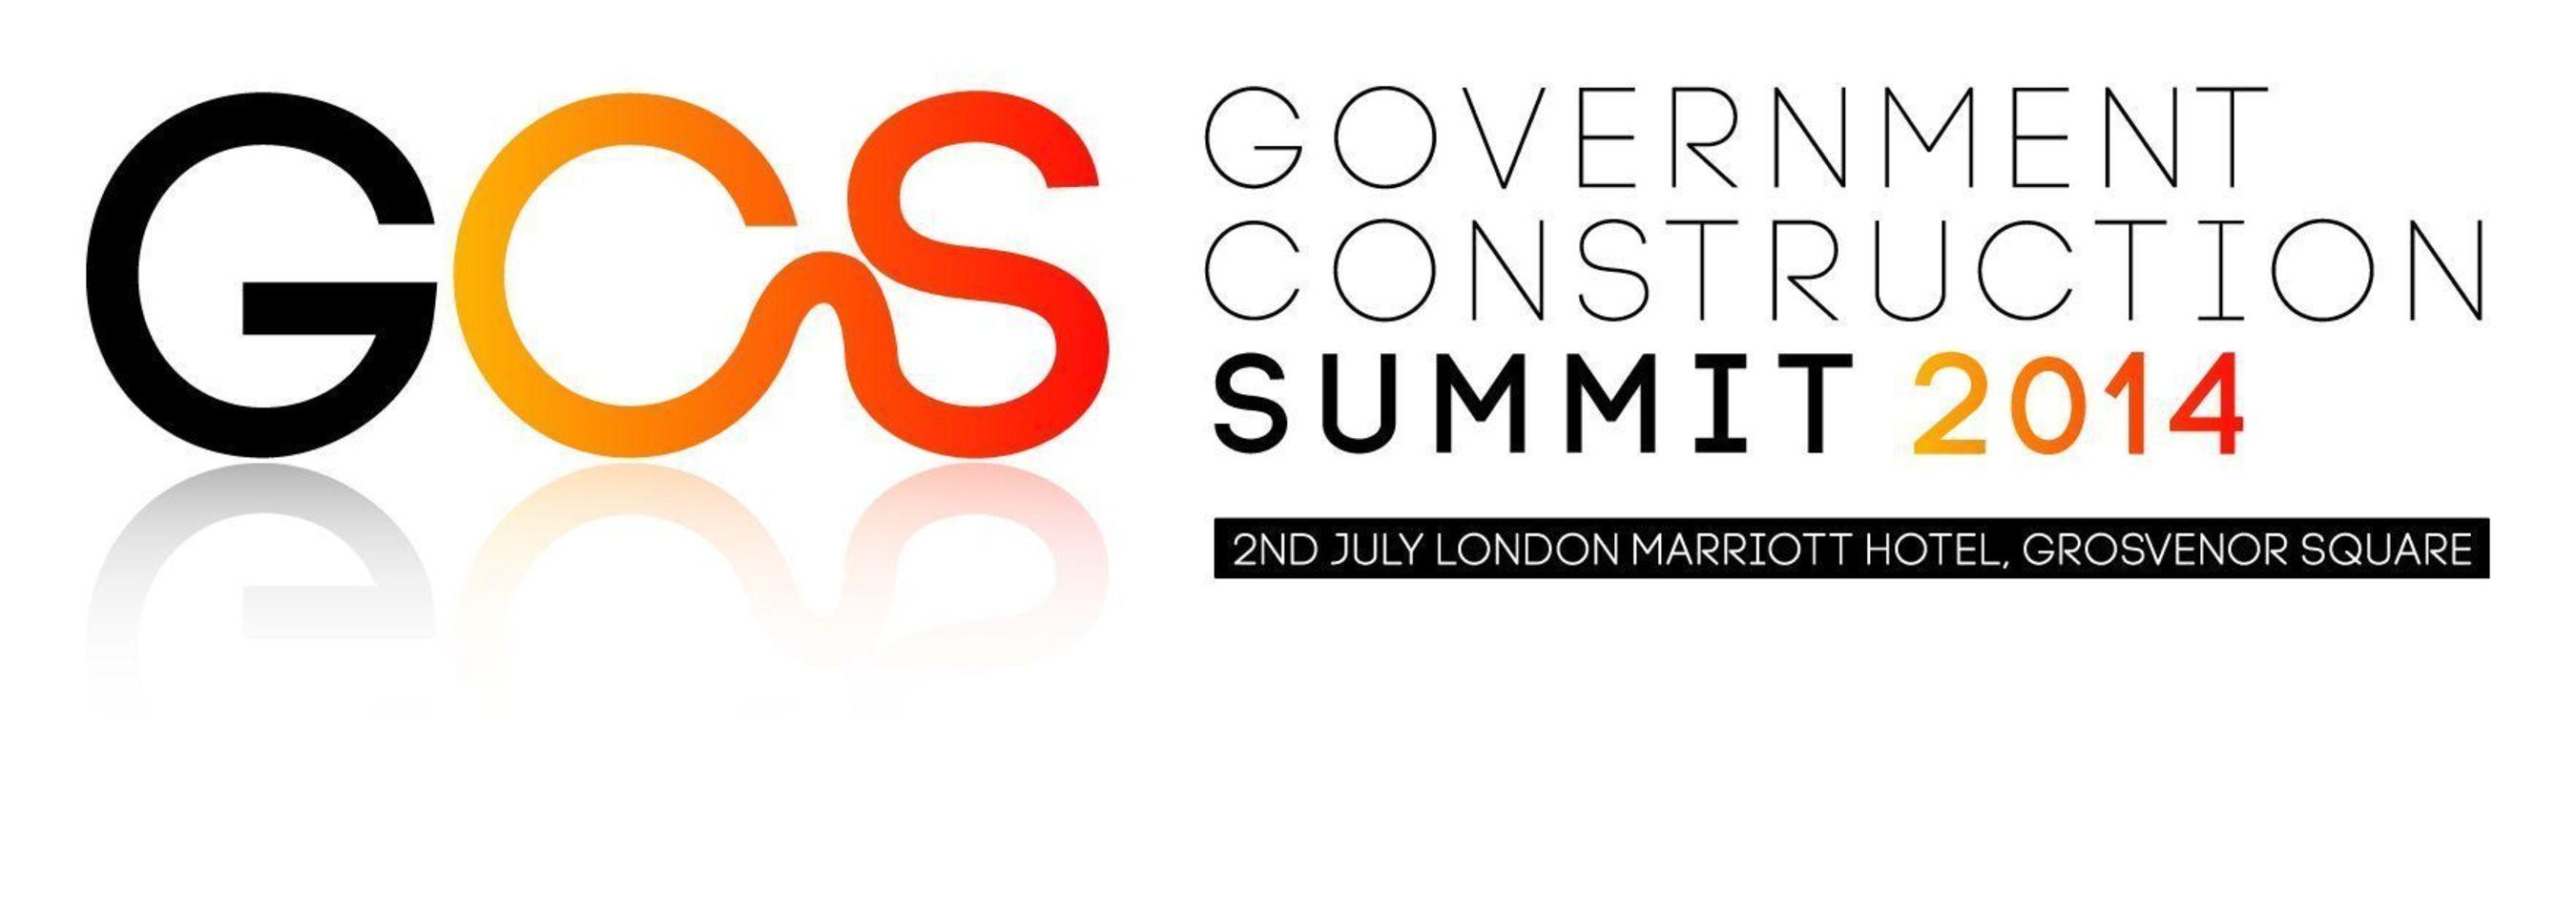 Government Construction Summit Logo (PRNewsFoto/Government Construction Summit)